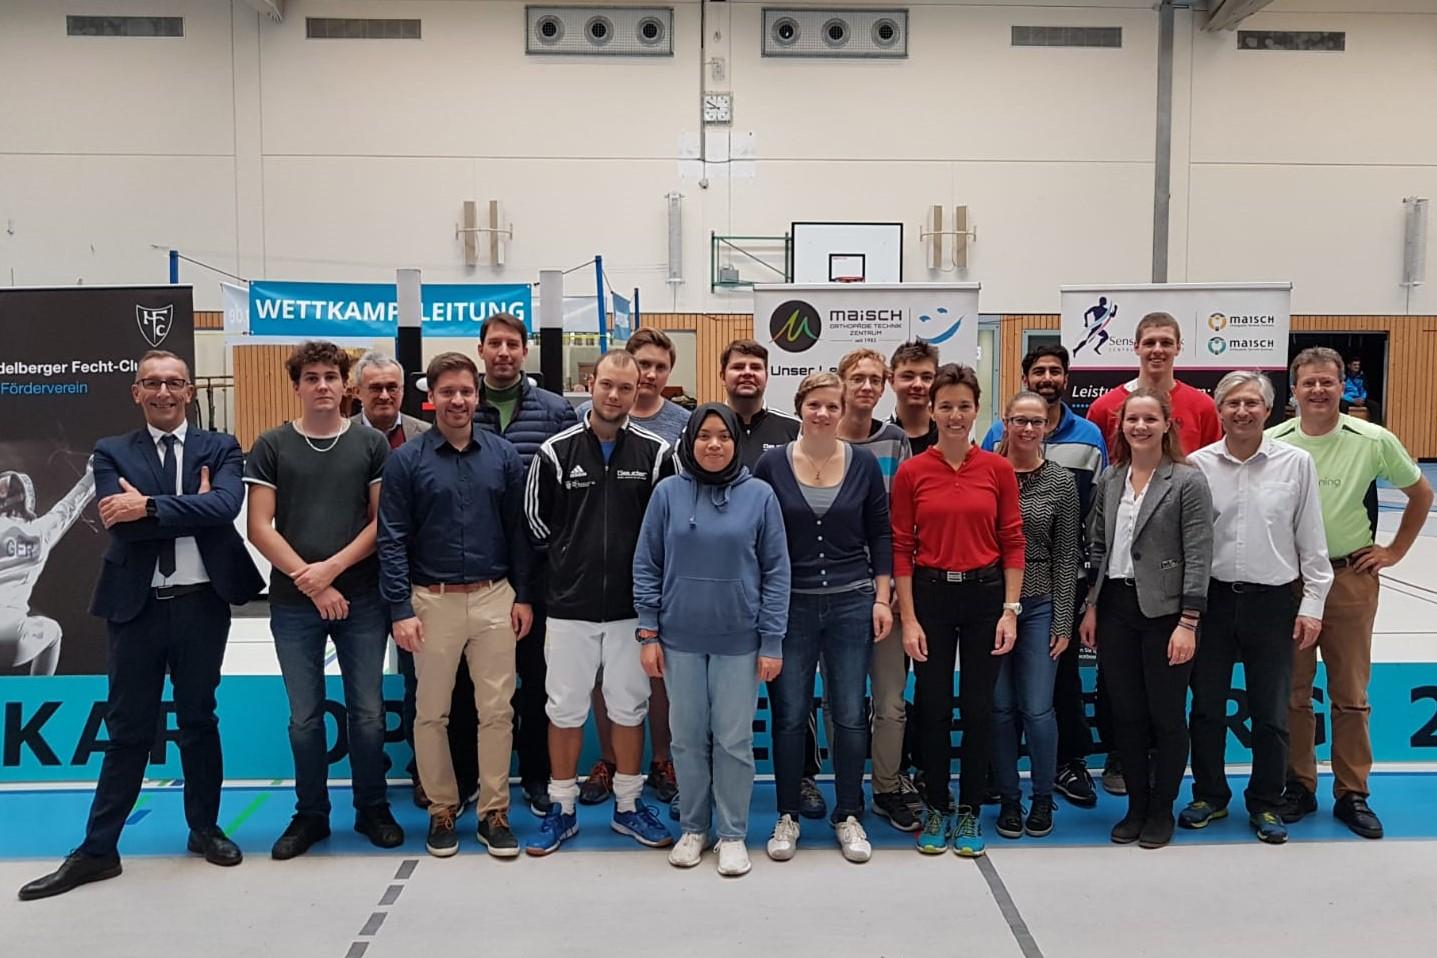 Heidelberg Fechten - Rhein-Neckar Open